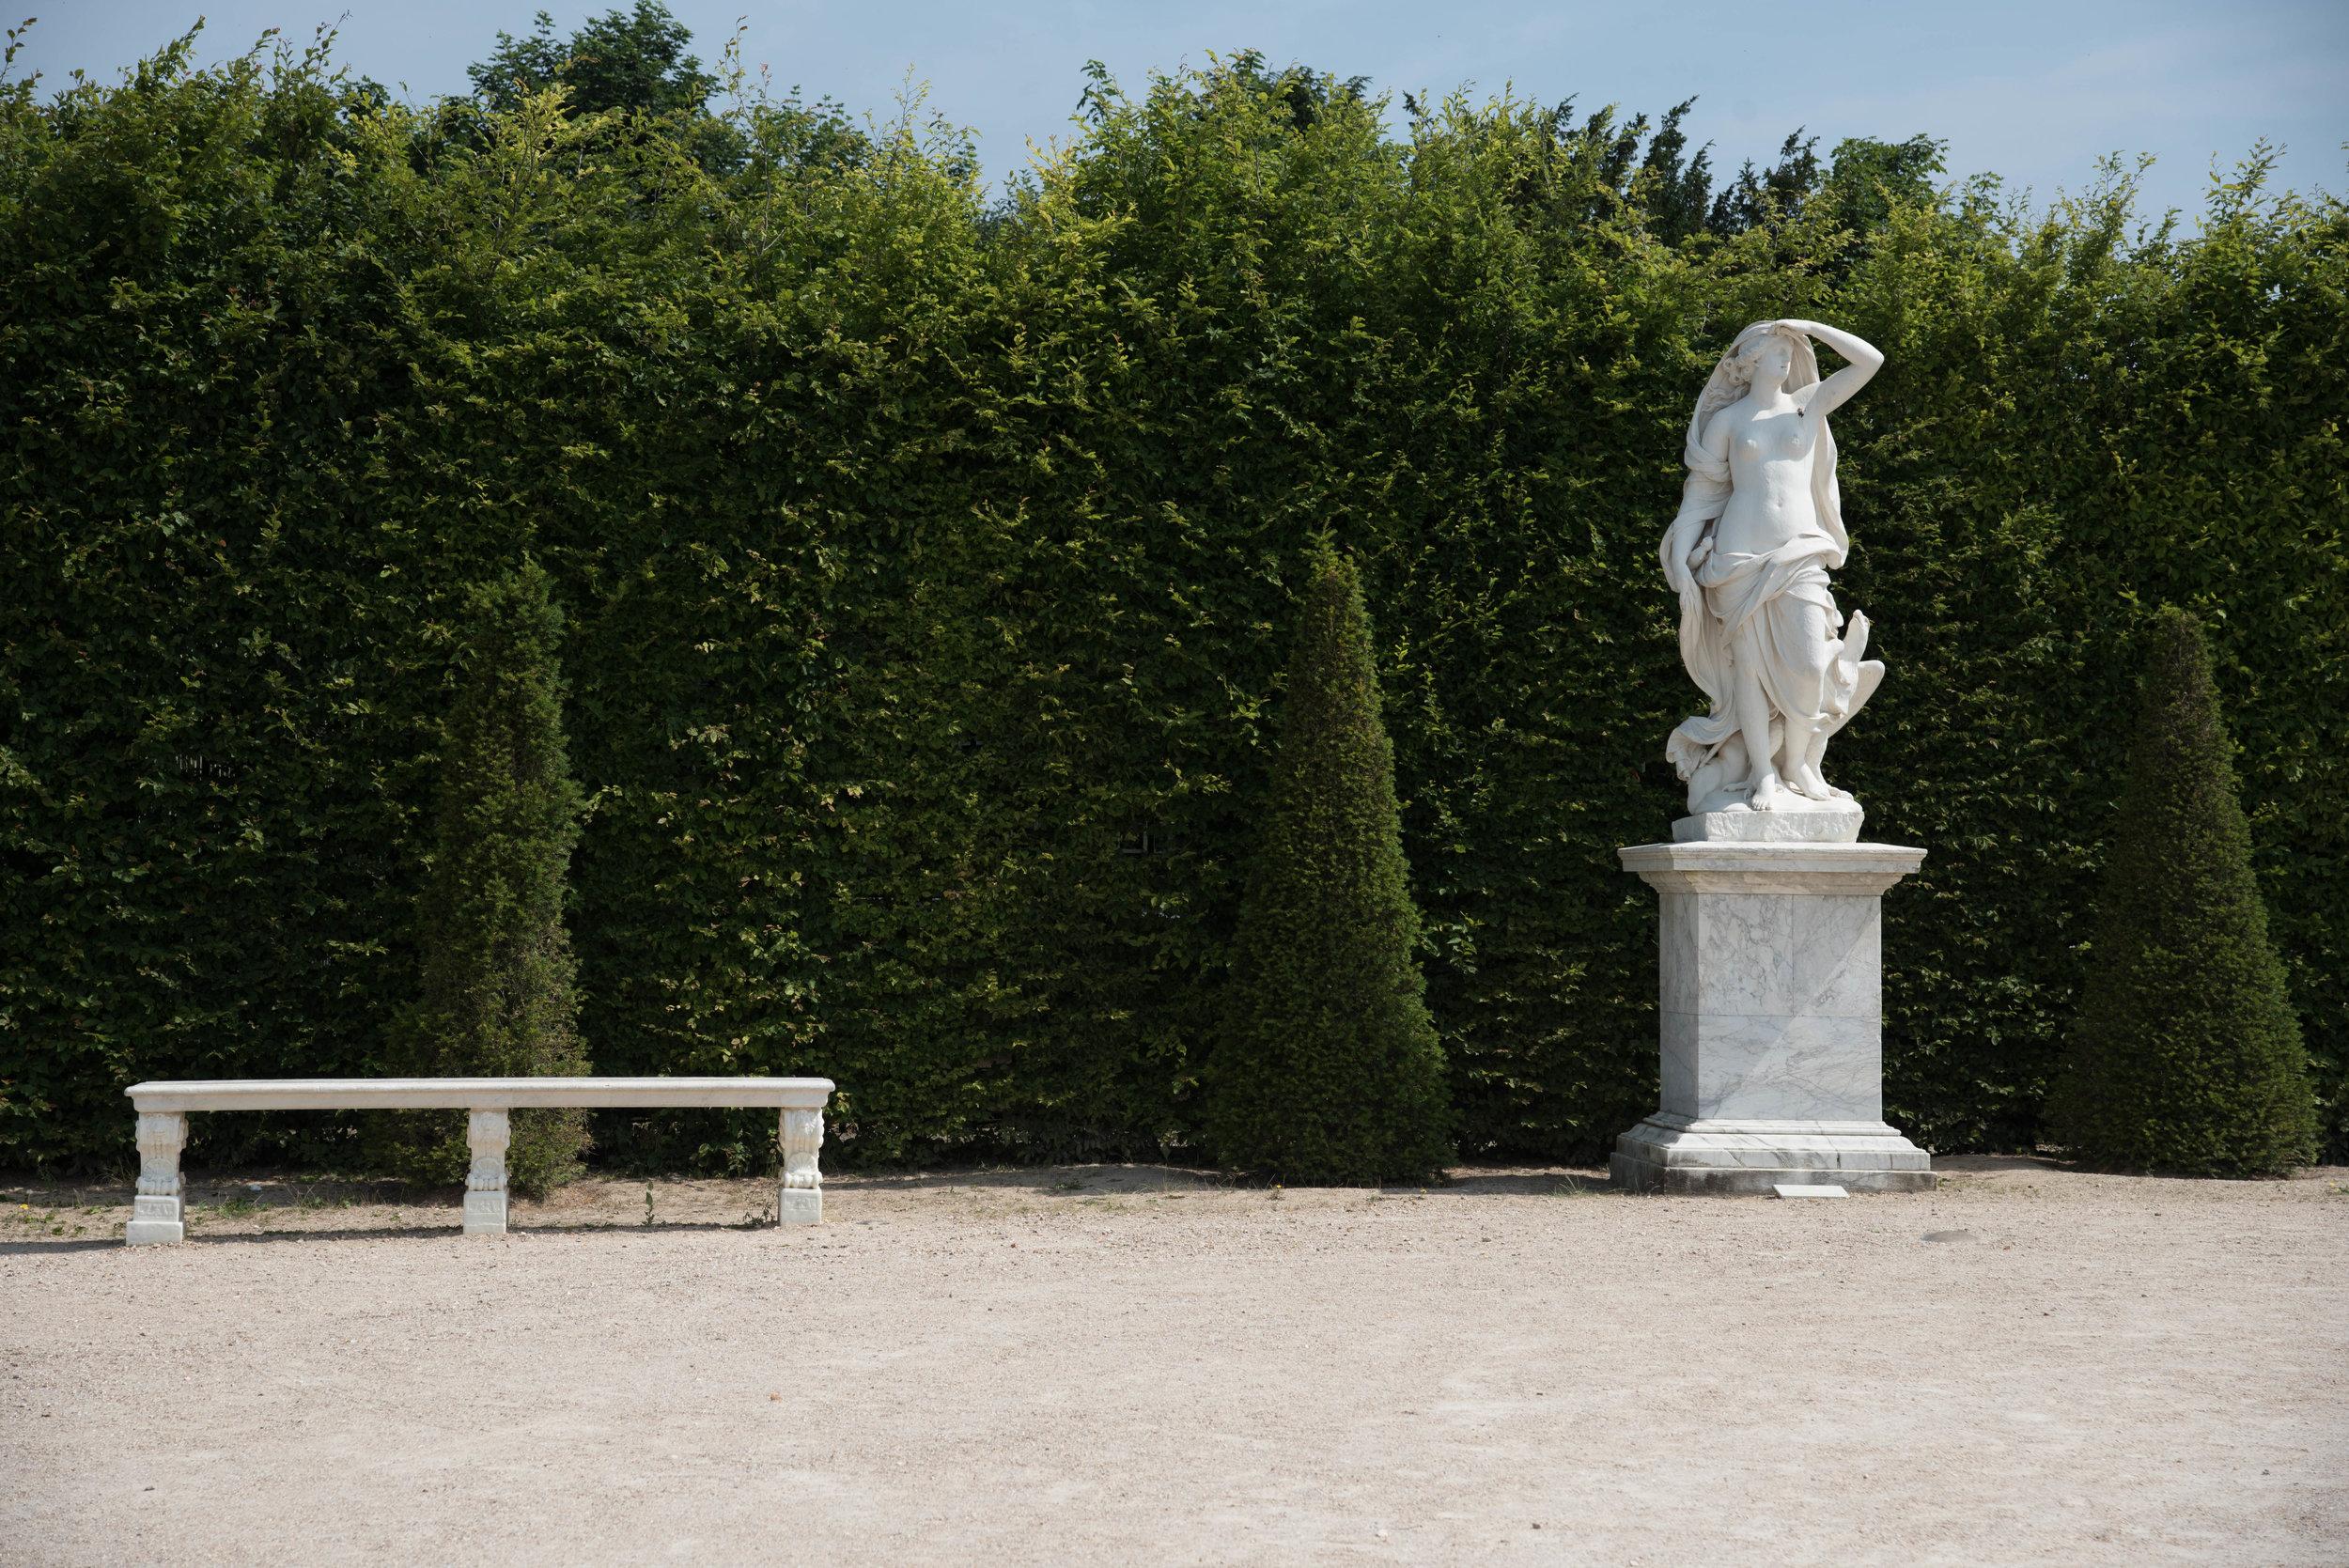 ROSE & IVY Journal Garden Dreamer | Solitude at Versailles